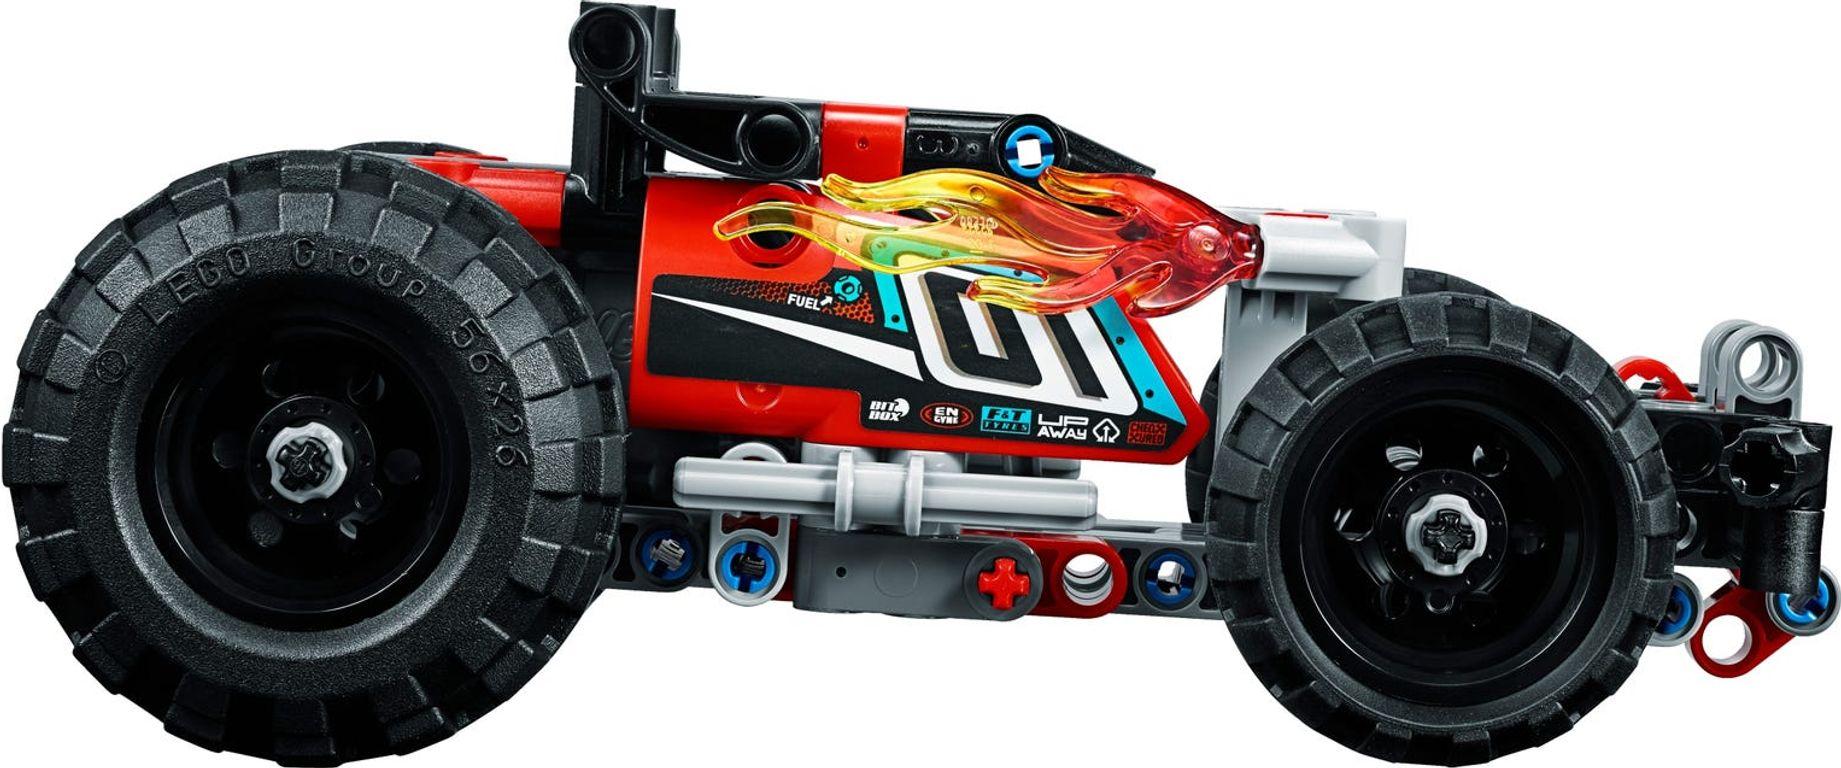 LEGO® Technic BASH! components